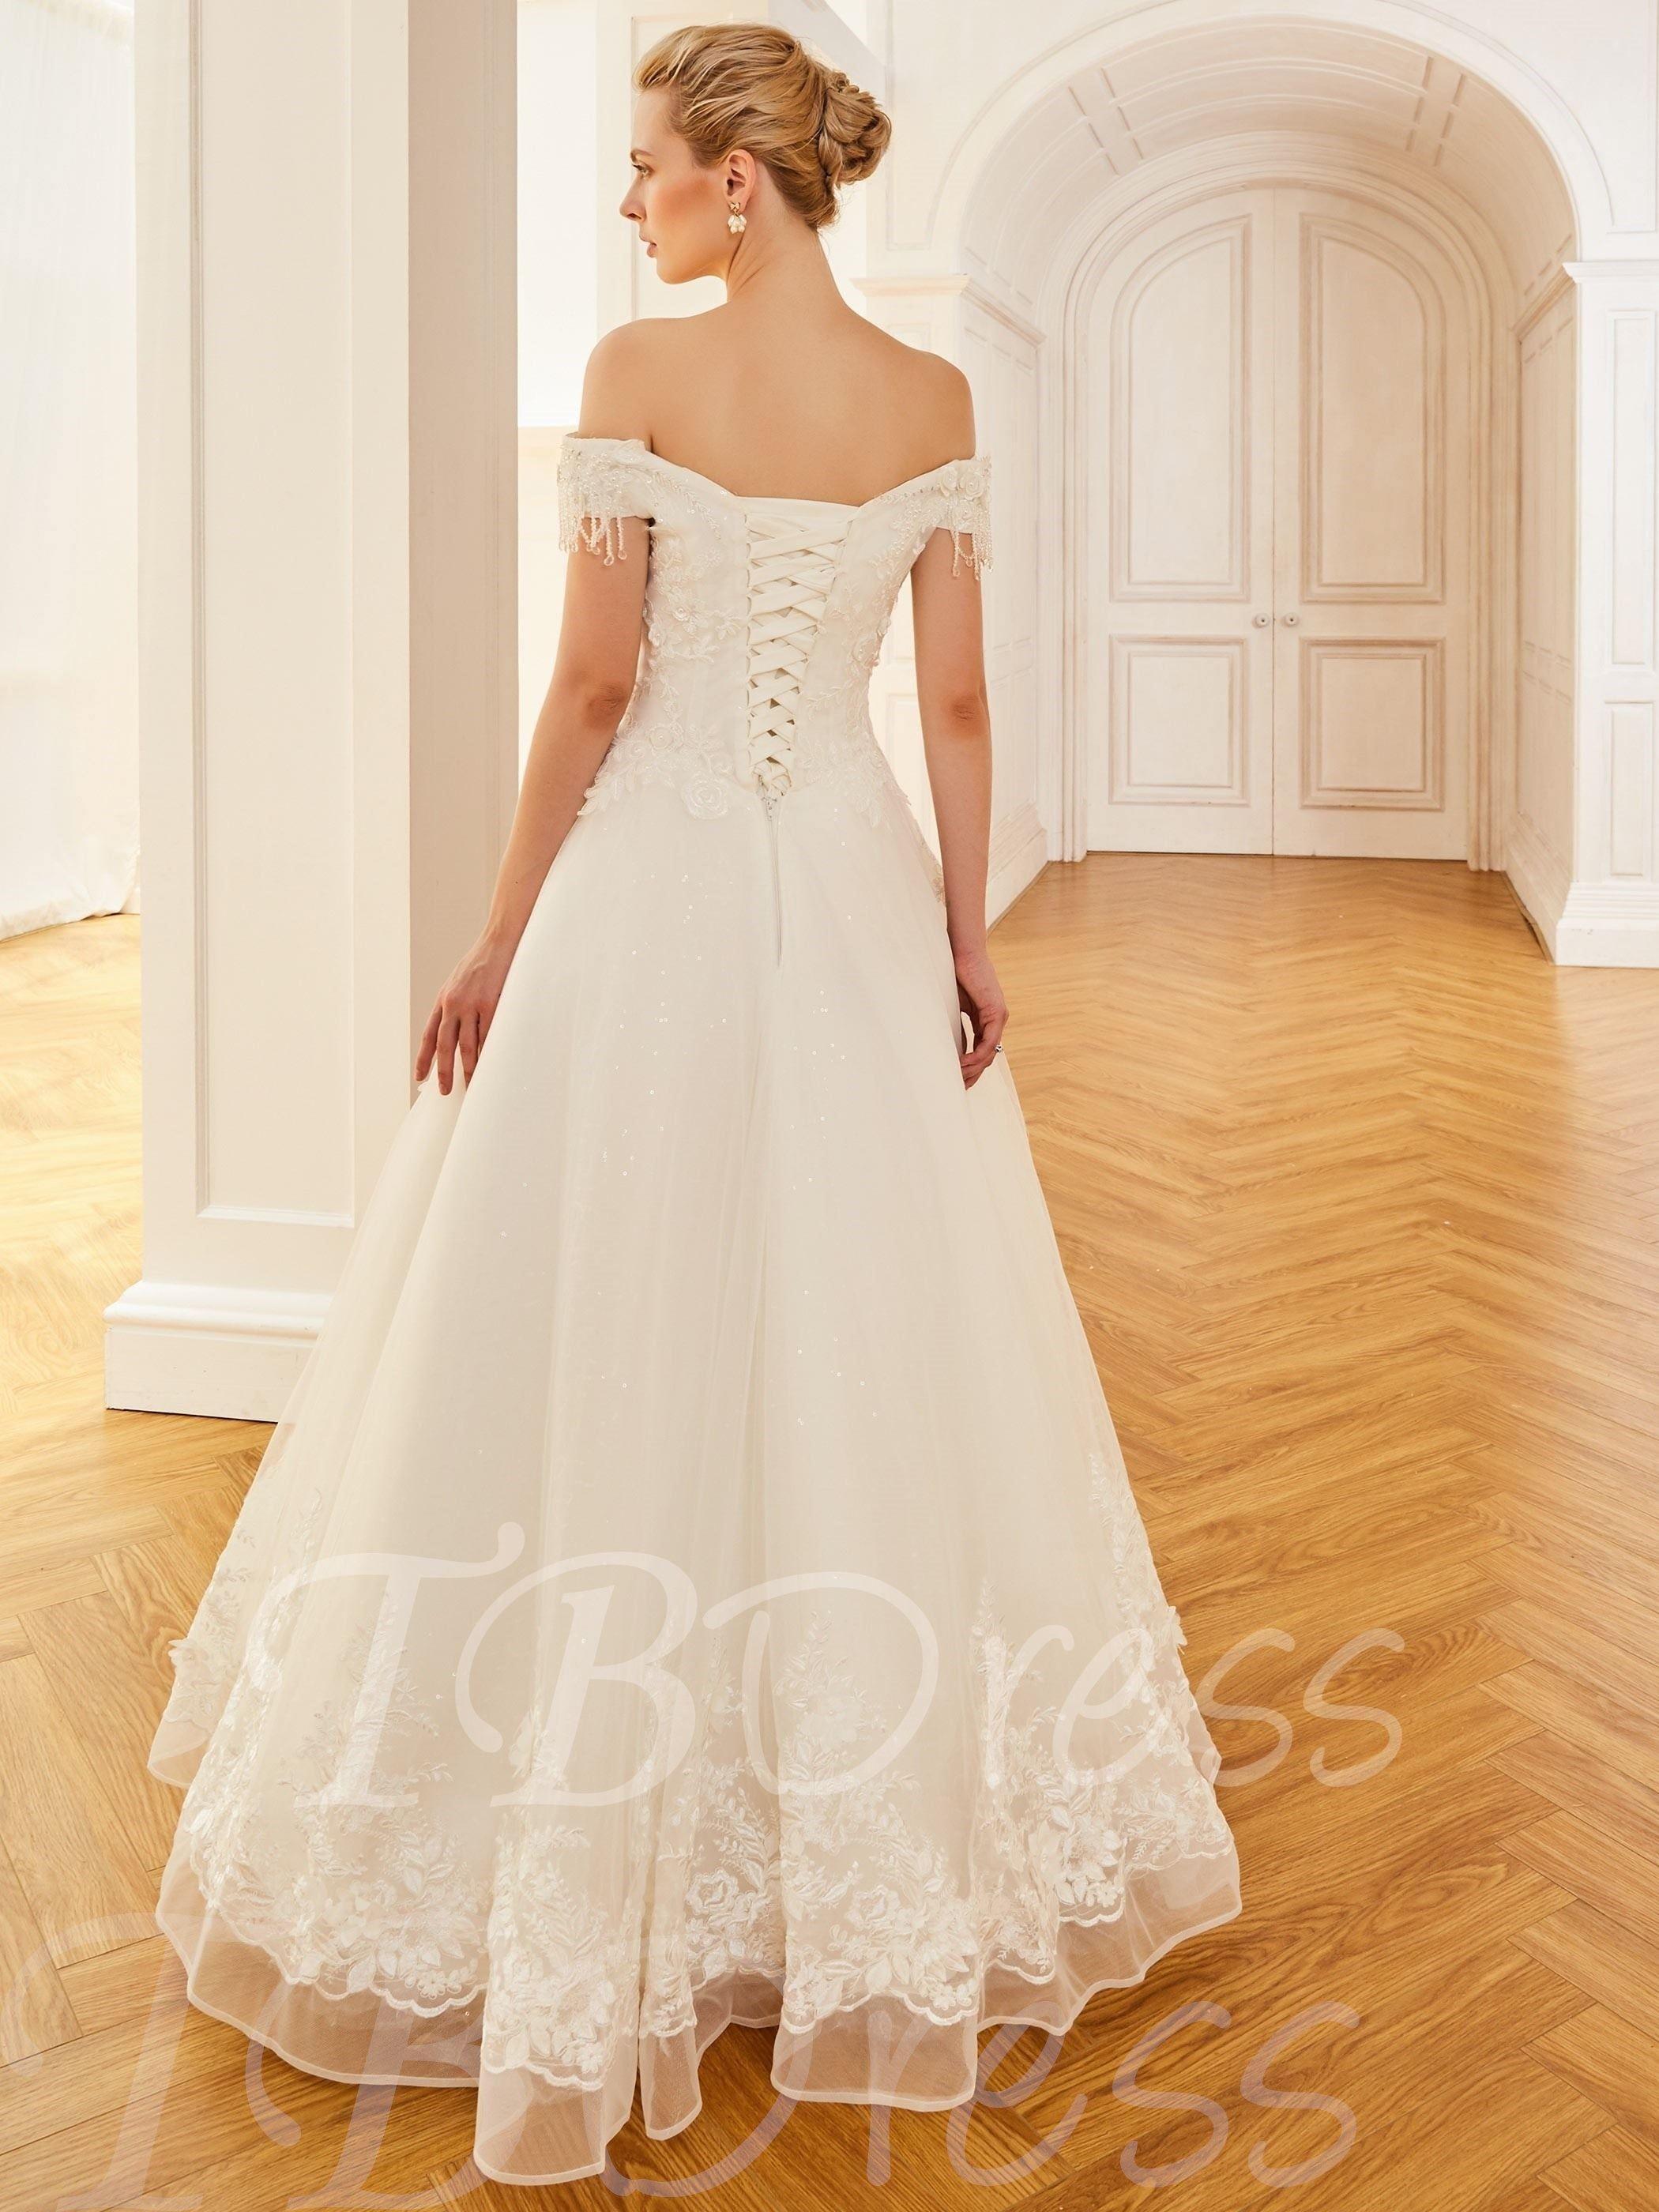 Cap Sleeves Beading Appliques Wedding Dress Wedding Dresses Summer Wedding Dress Wedding Dress Inspiration [ 2800 x 2100 Pixel ]